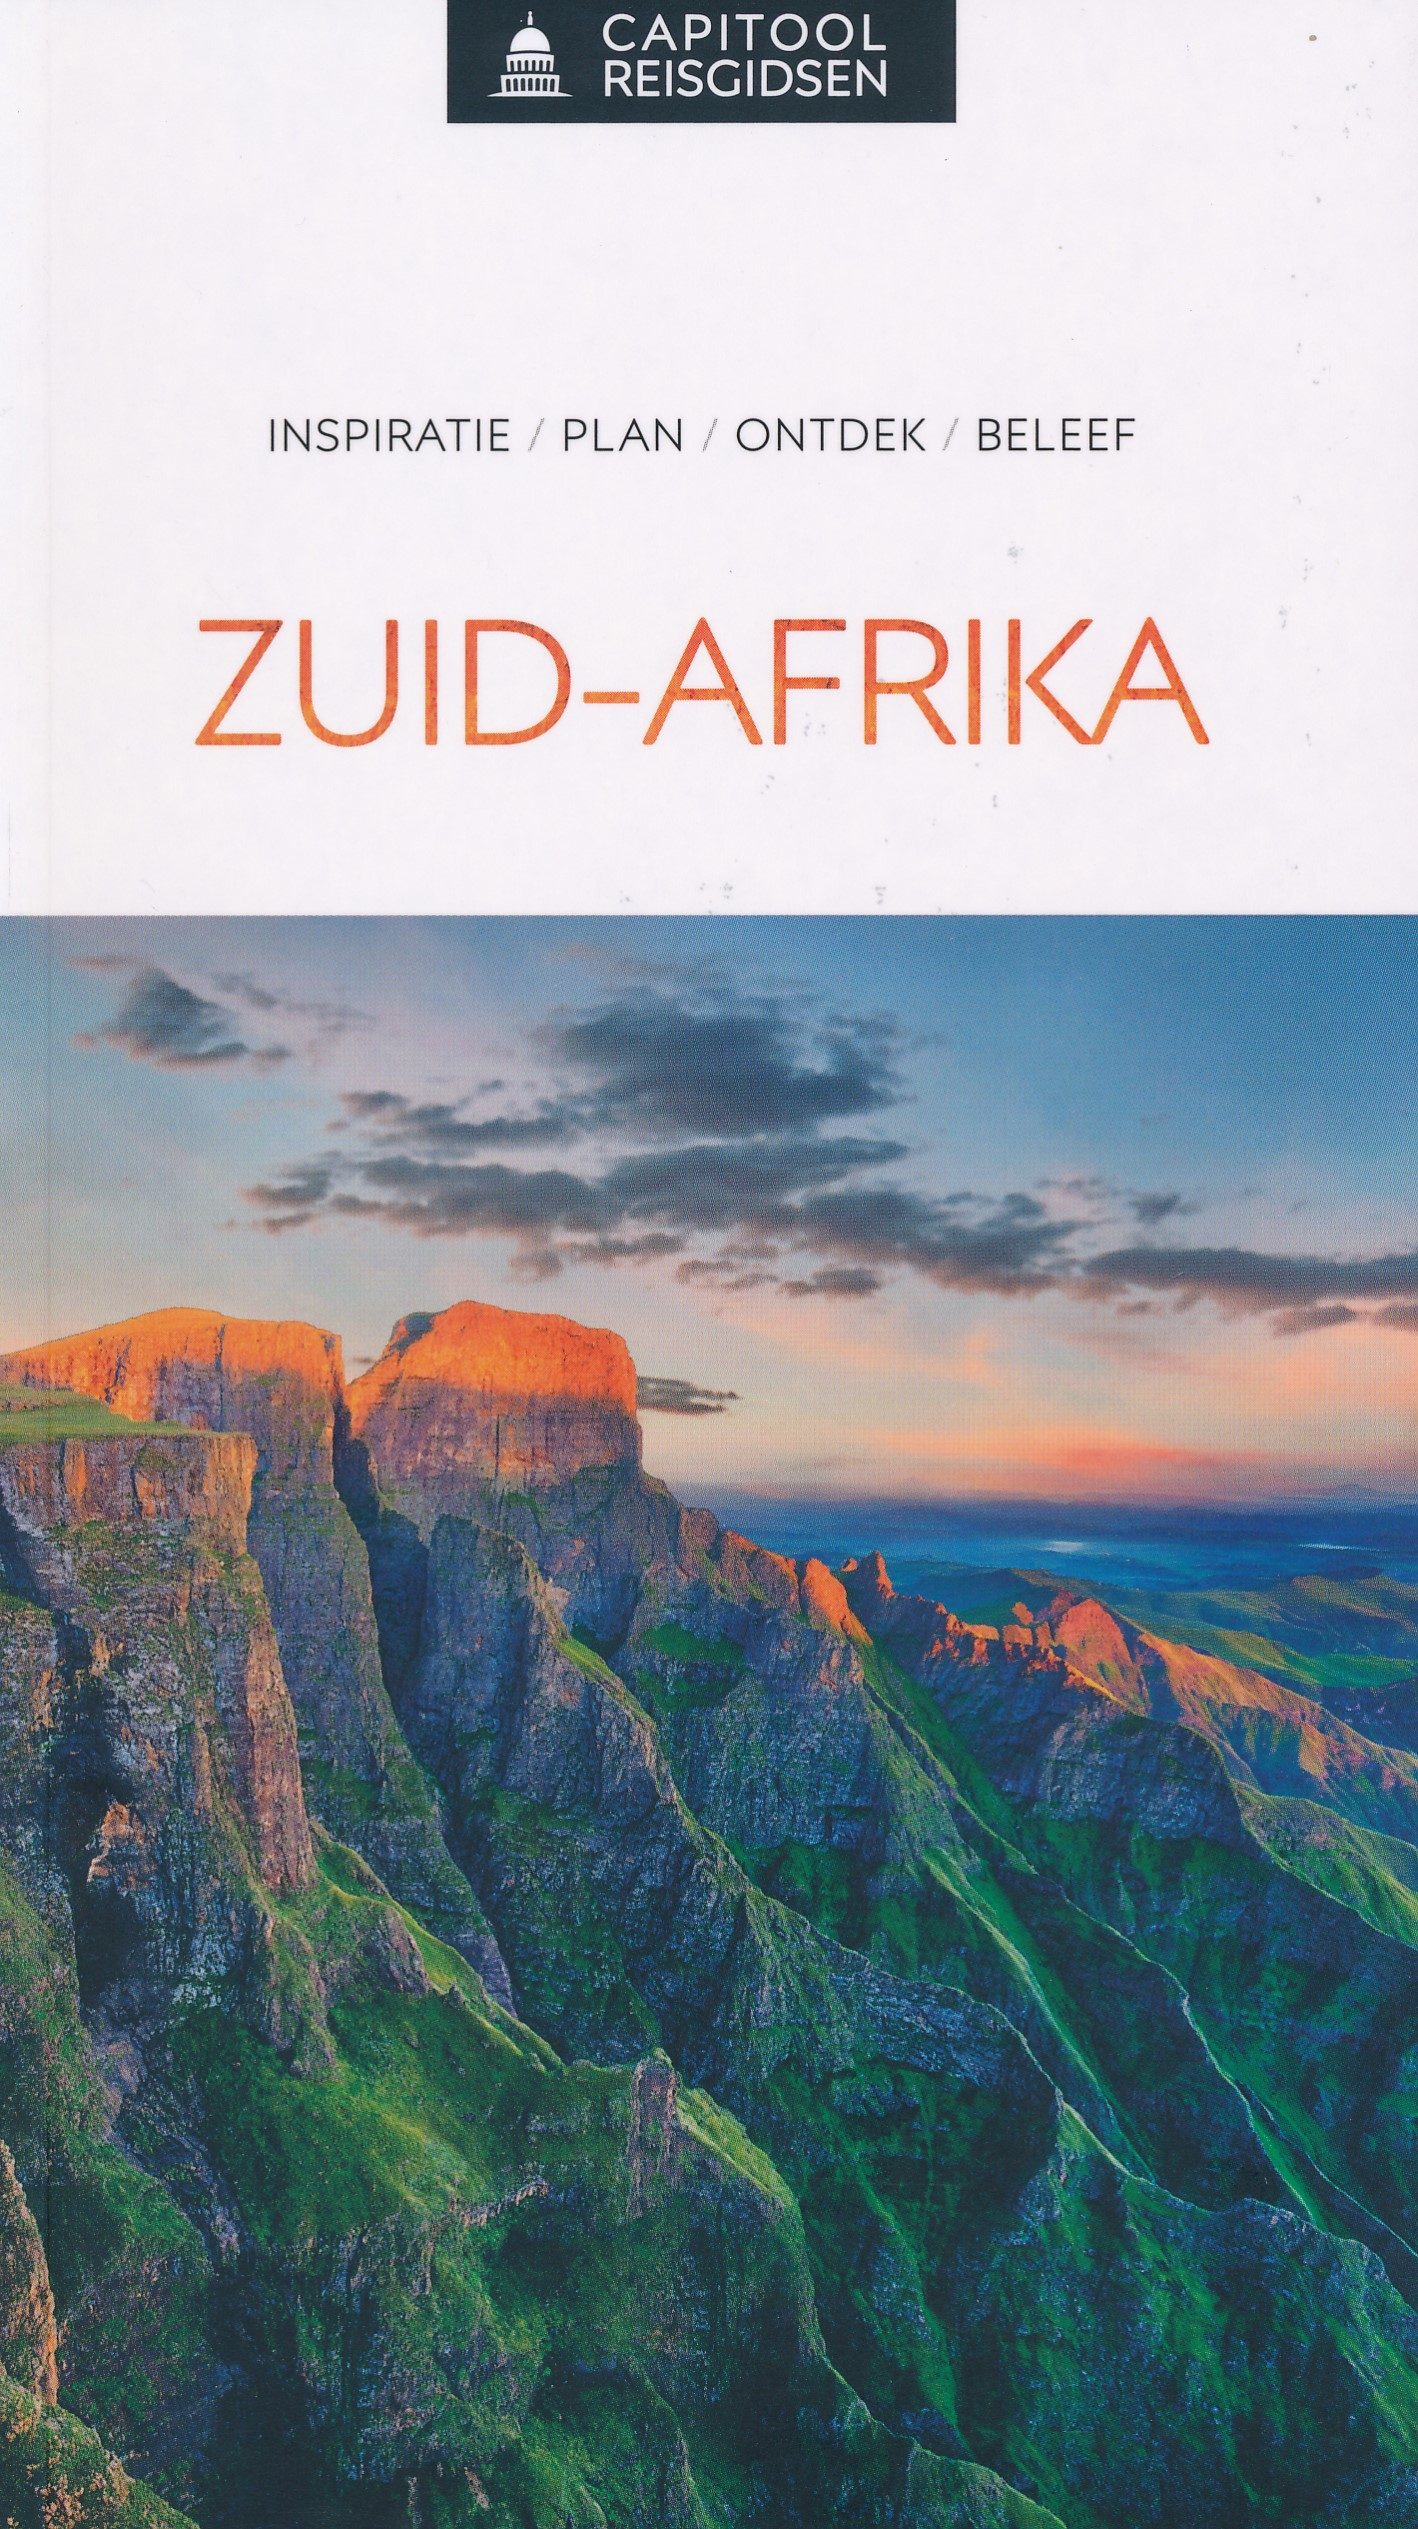 Reisgids Capitool Reisgidsen Zuid Afrika | Unieboek